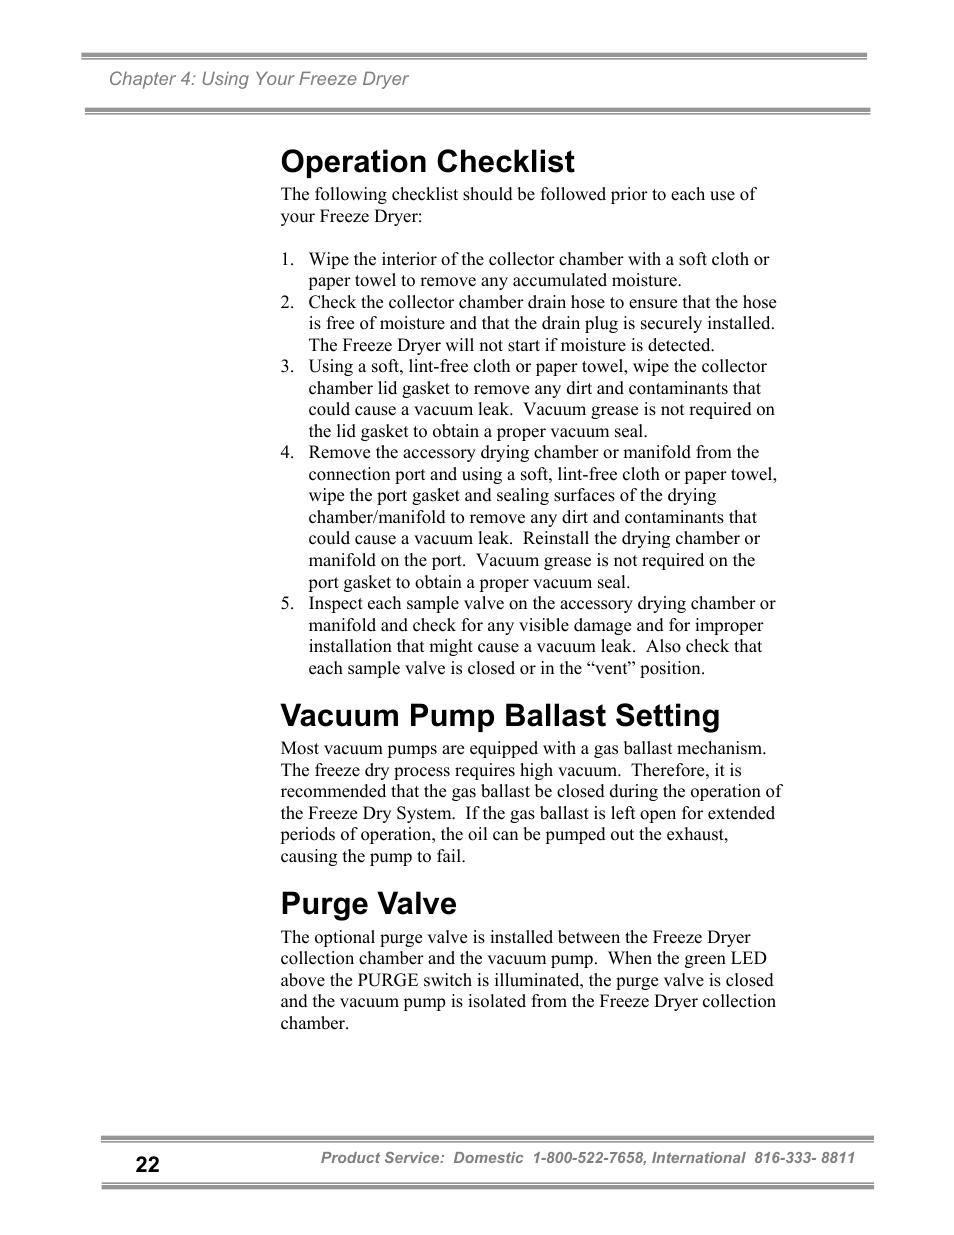 Operation checklist, Vacuum pump ballast setting, Purge